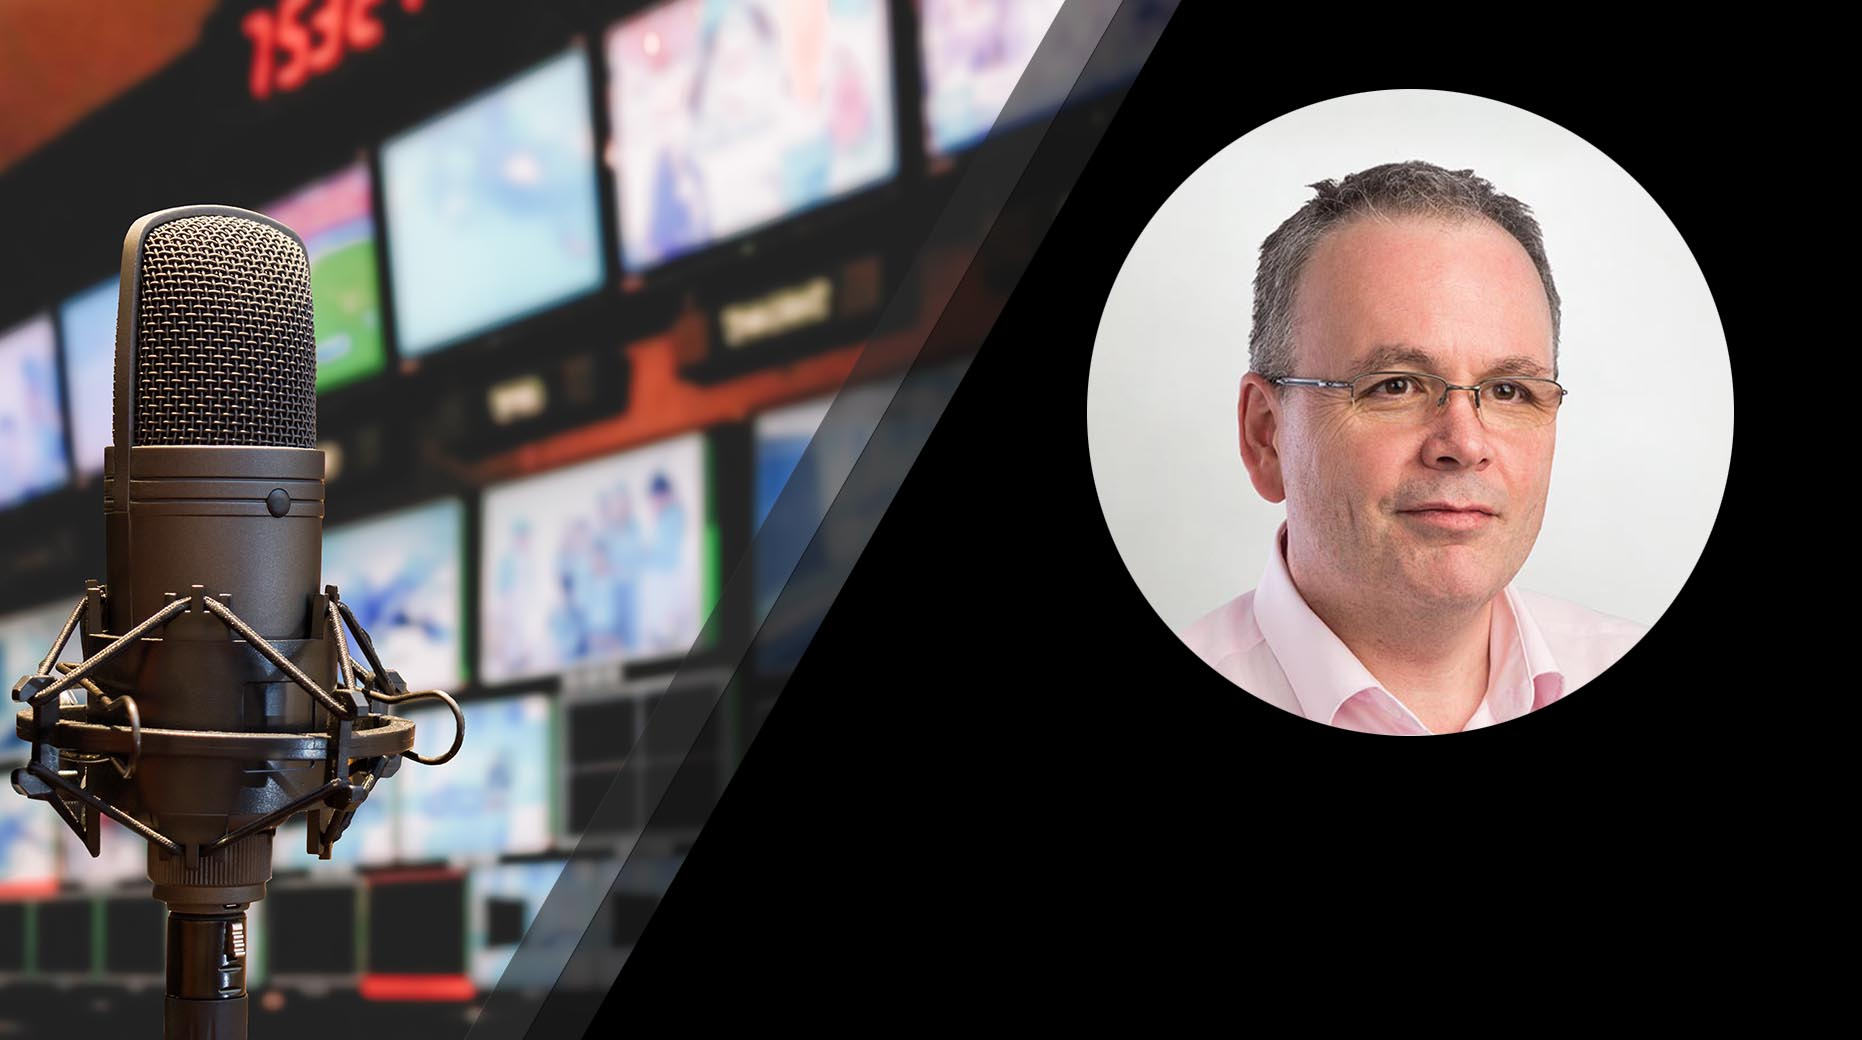 Bobby Hain on the Making the Media podcast